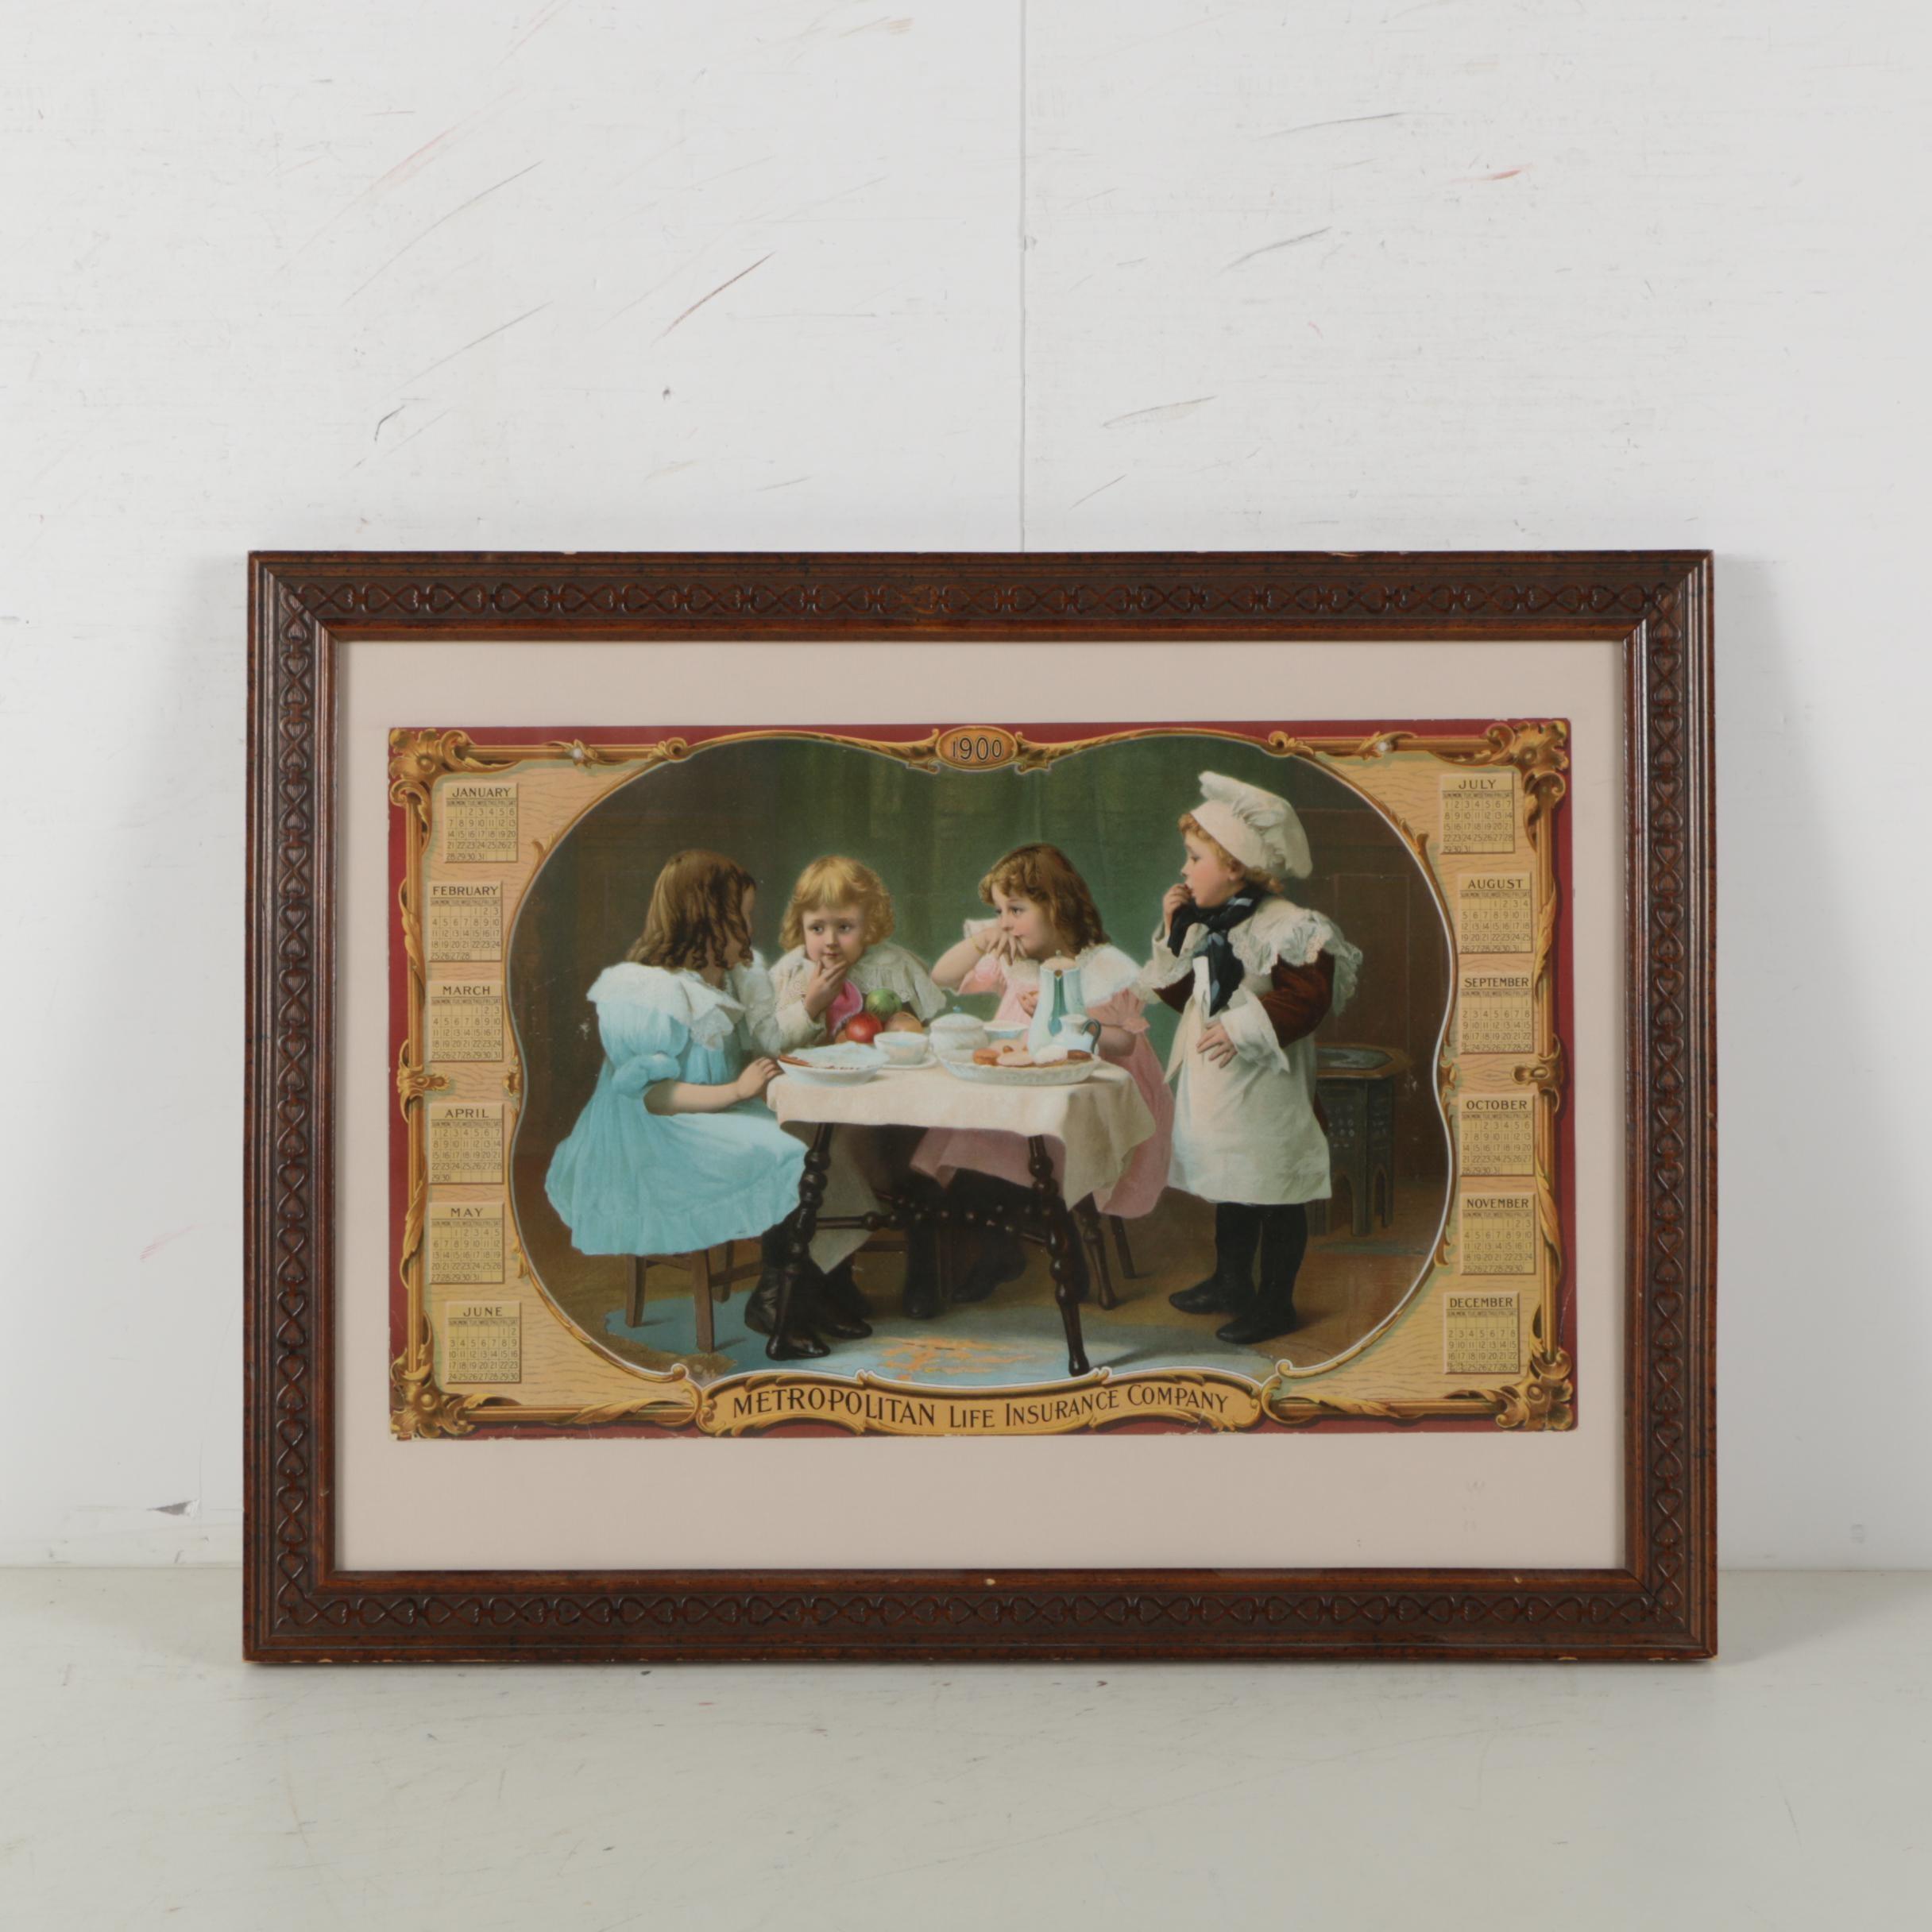 Antique Chromolithograph Advertisement for Metropolitan Life Insurance